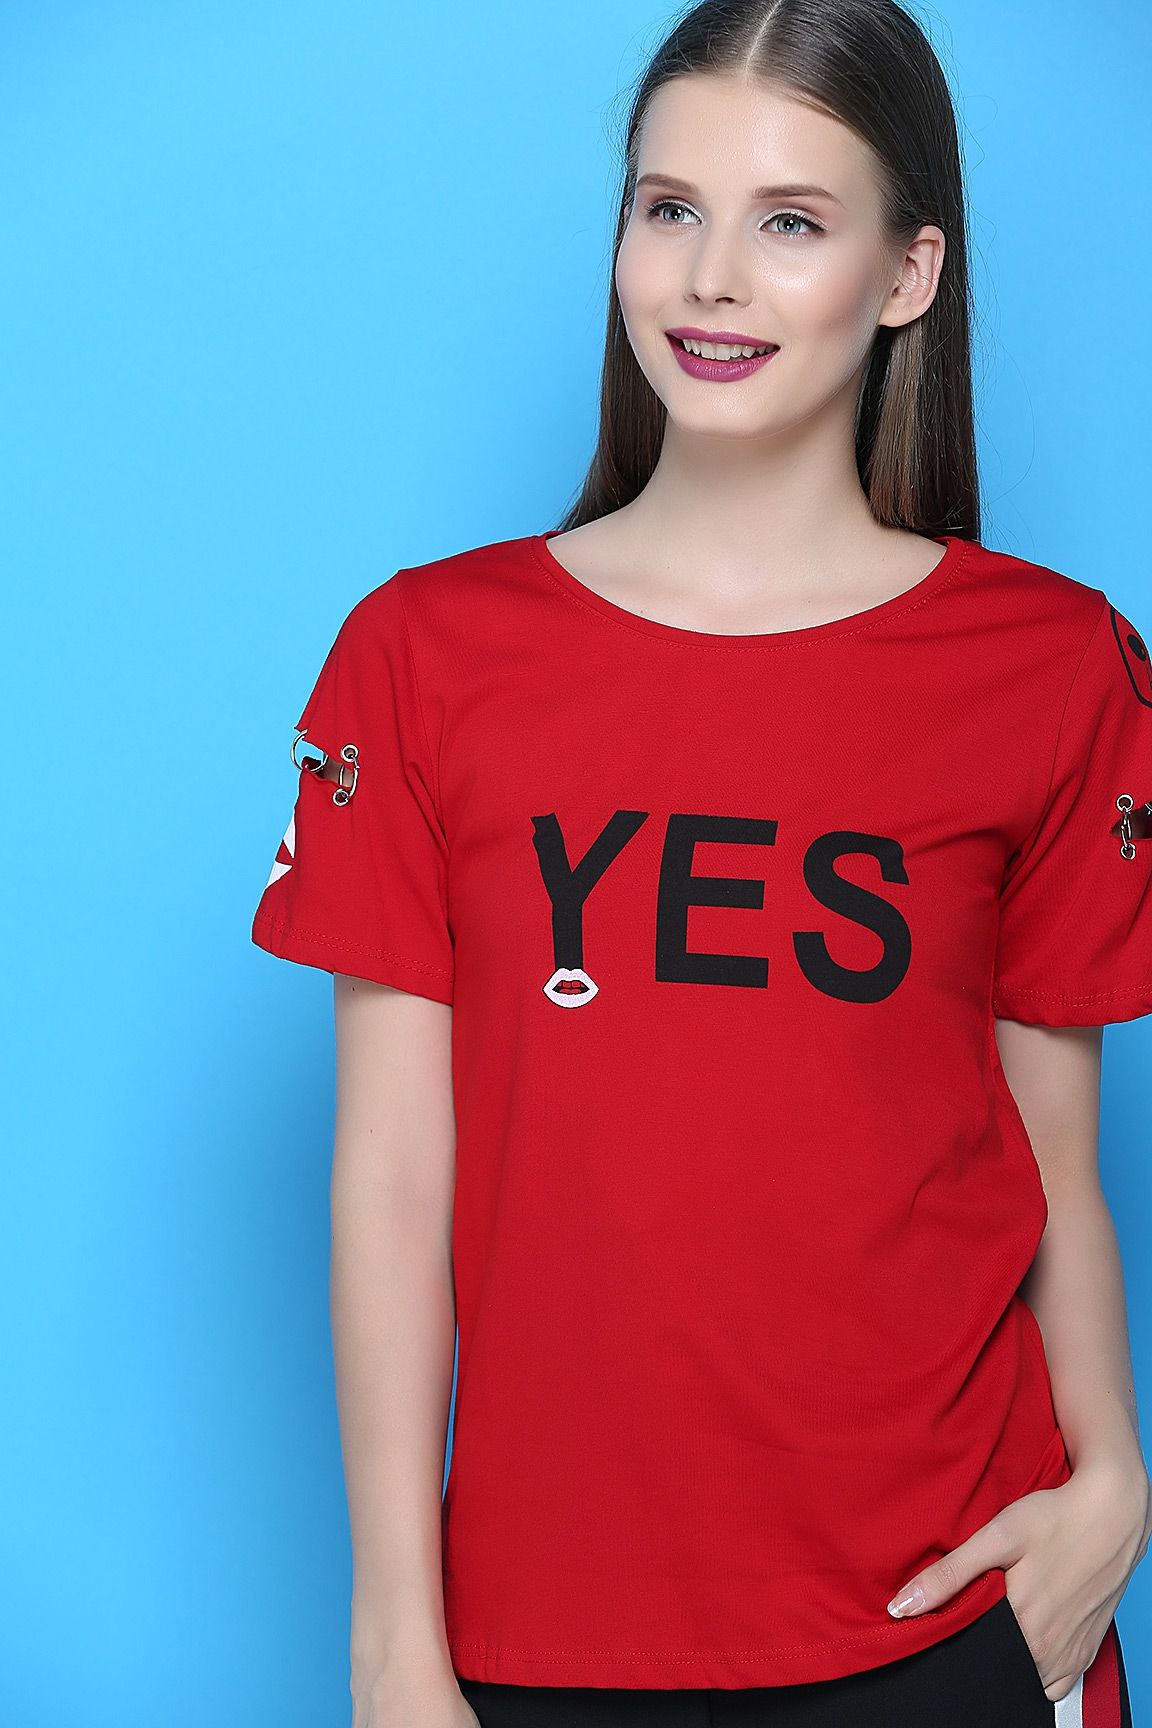 Kadin T Shirt V Yaka Tisort Bisiklet Yaka T Shirt Modelleri Tozlu Com Kadin V Yaka Tisort